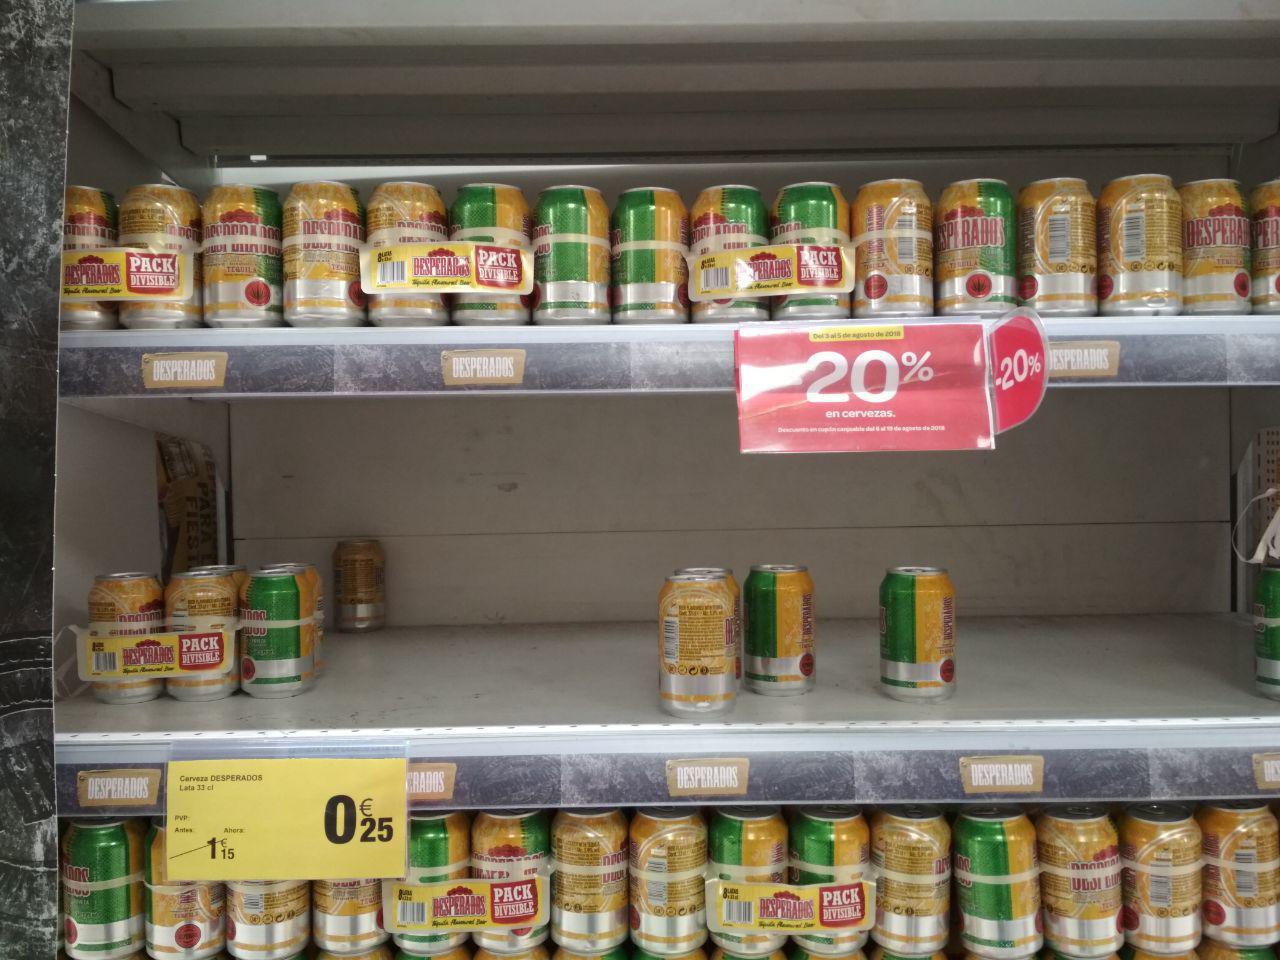 Cerveza Desperados Lata 33cl en Carrefour